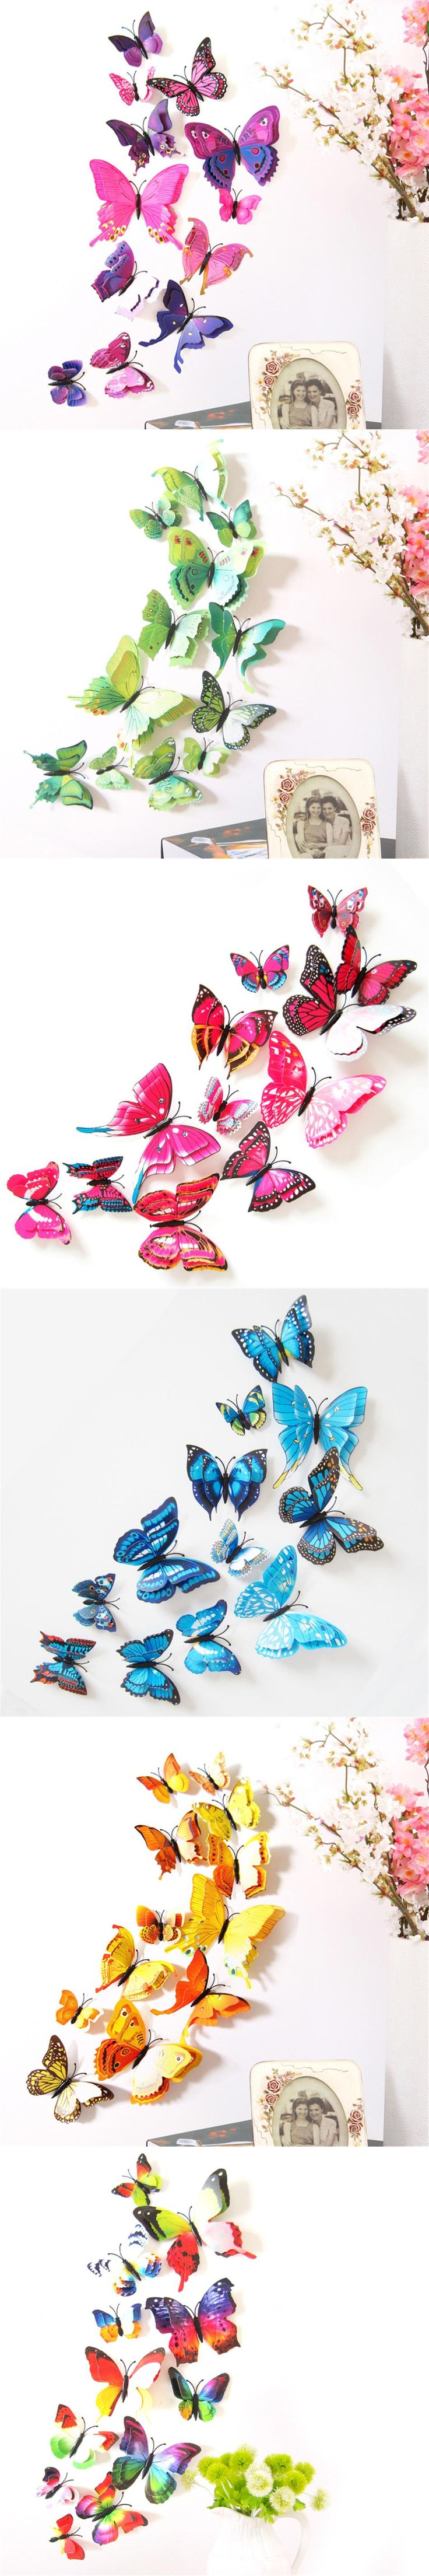 100 diy ombre butterfly wall art 3 d butterfly wall art